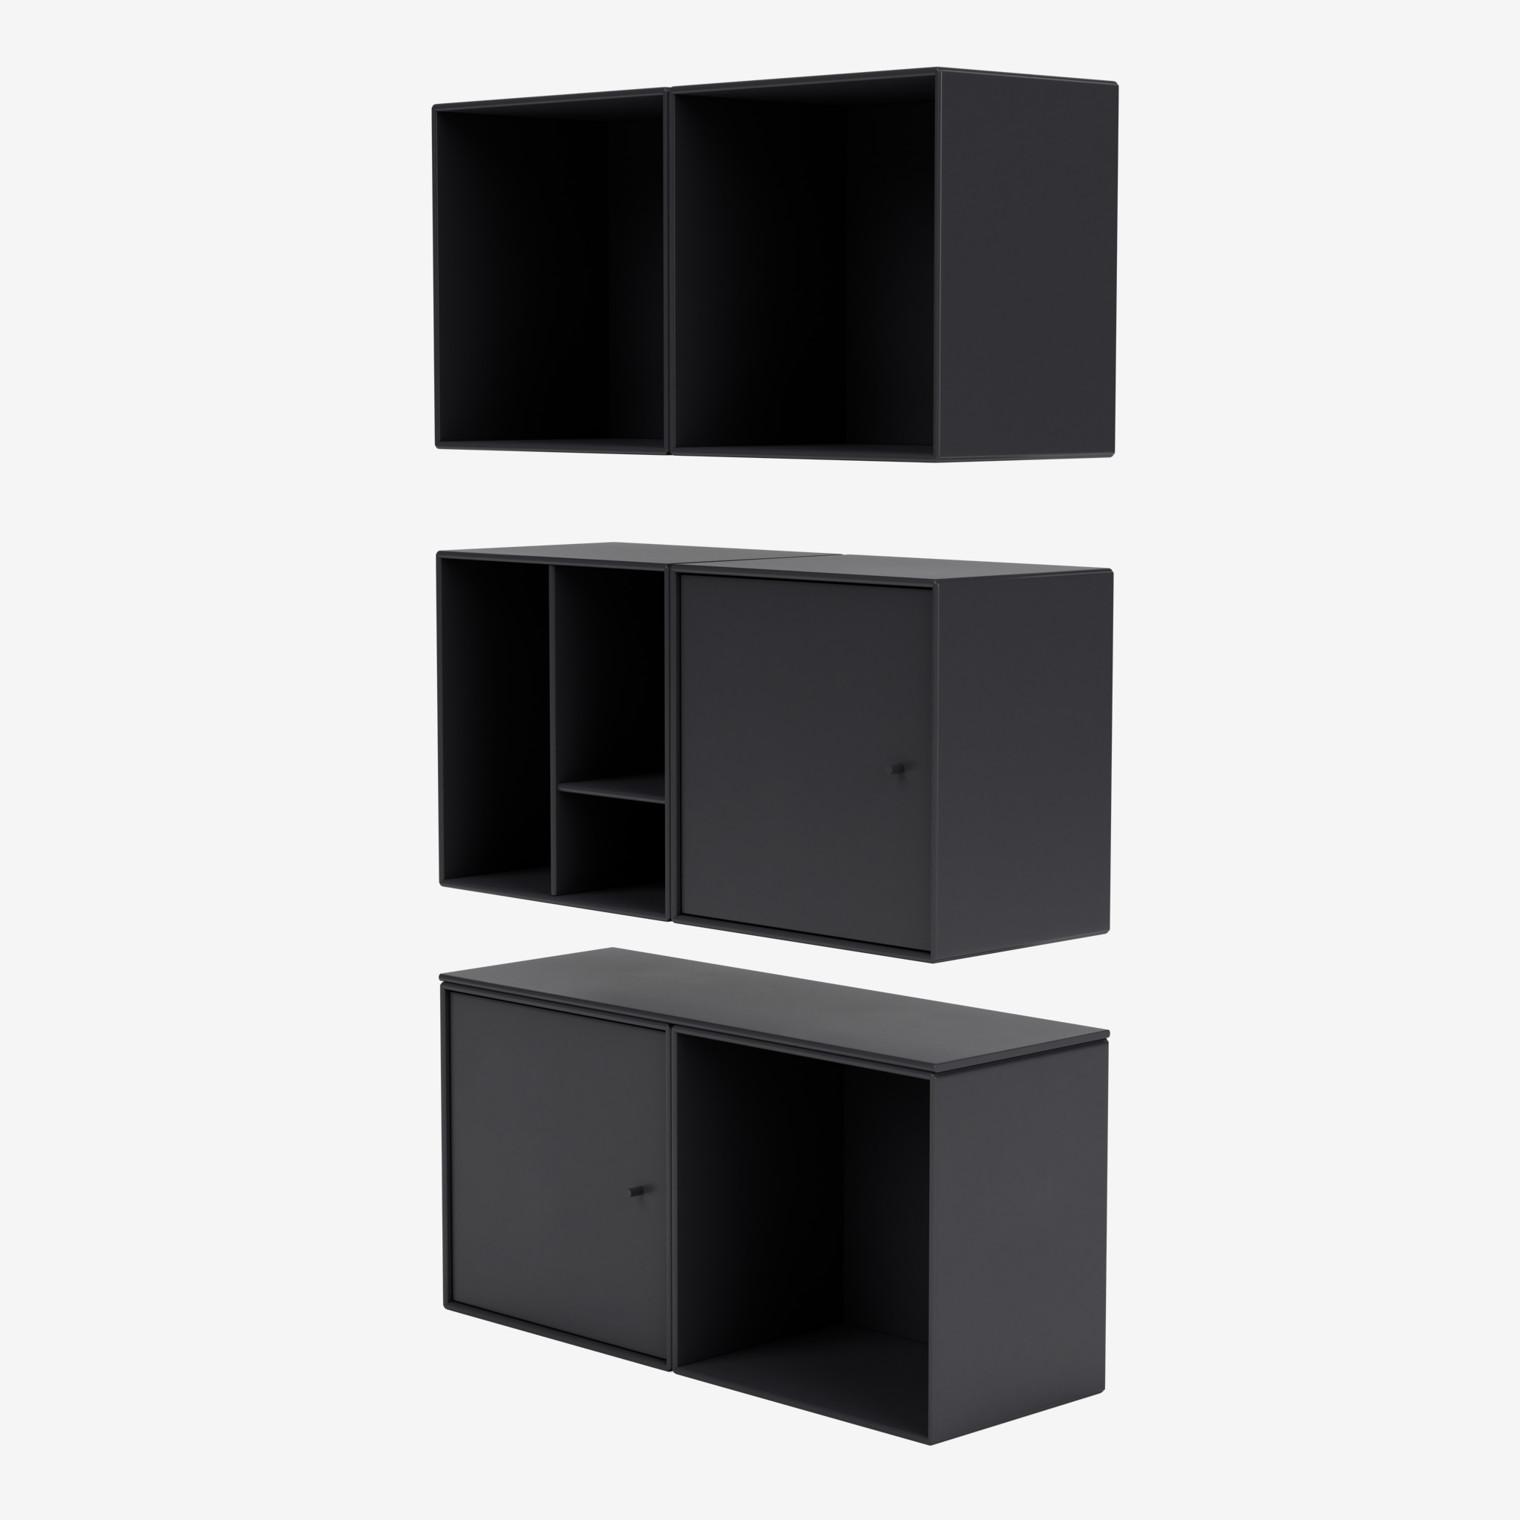 Montana Mini 3007 vertical shelf